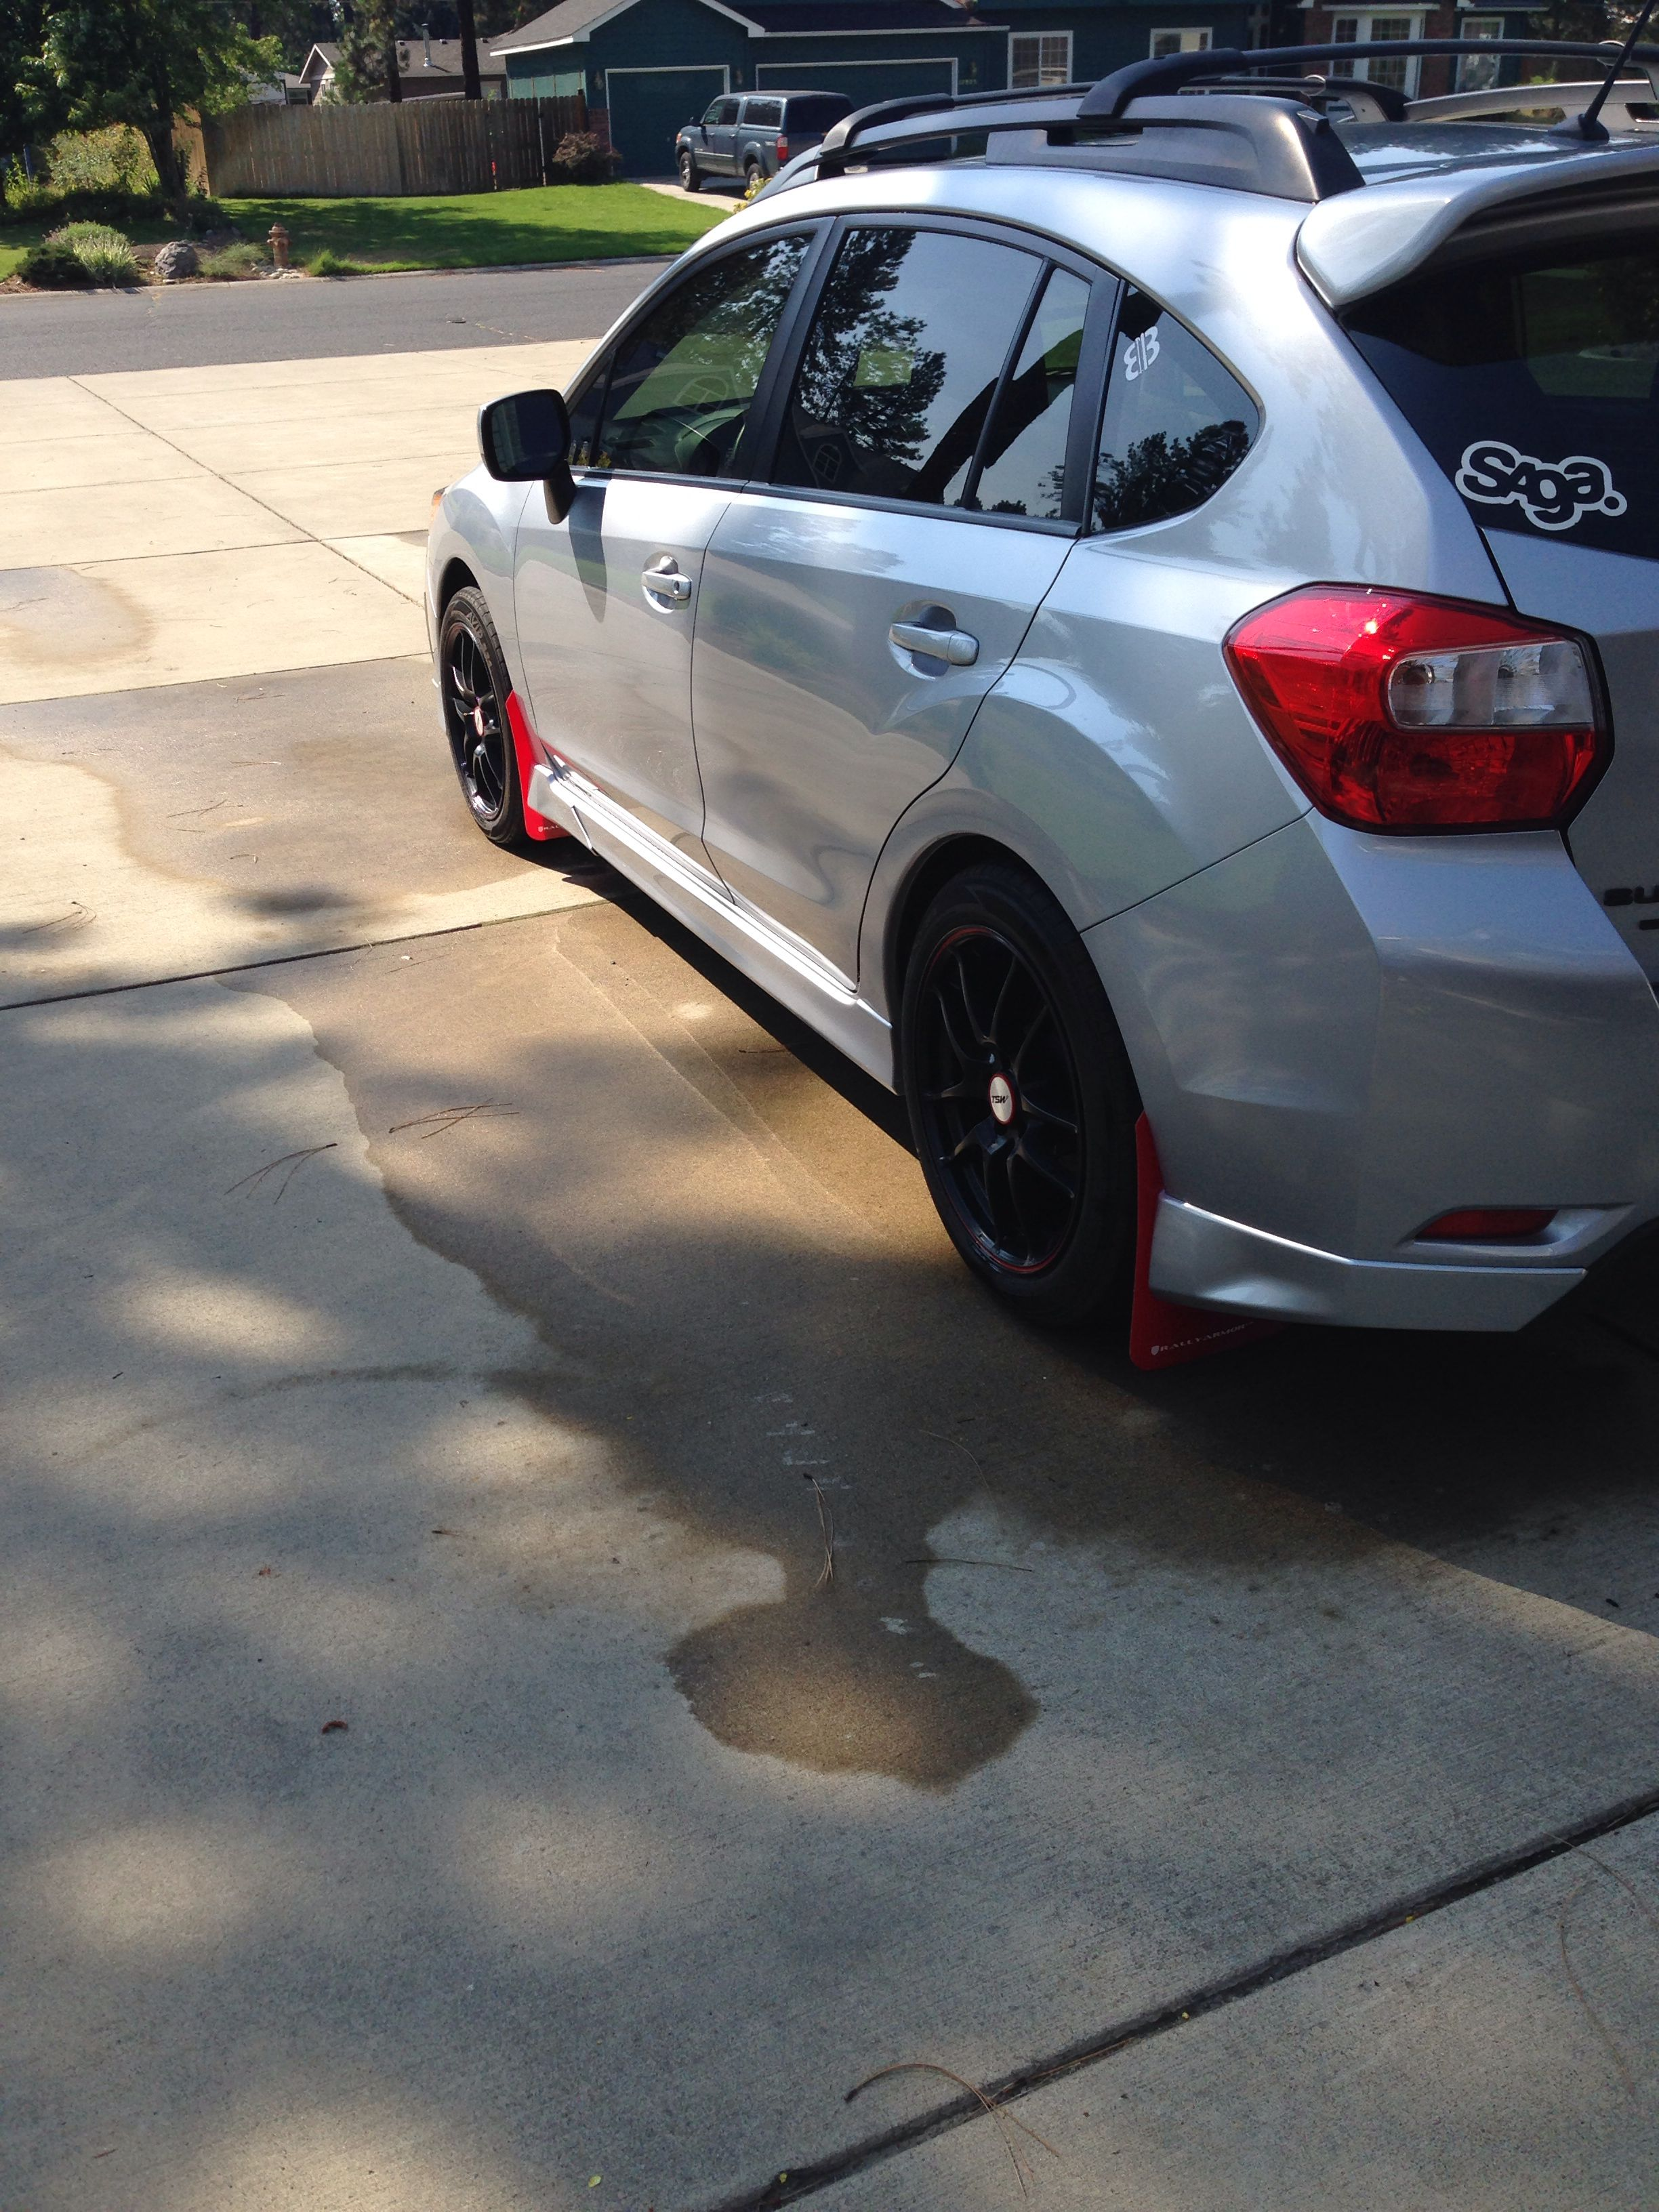 My whip  Subaru Impreza Sport 2 0i Hatch  | Subies, Subies and more